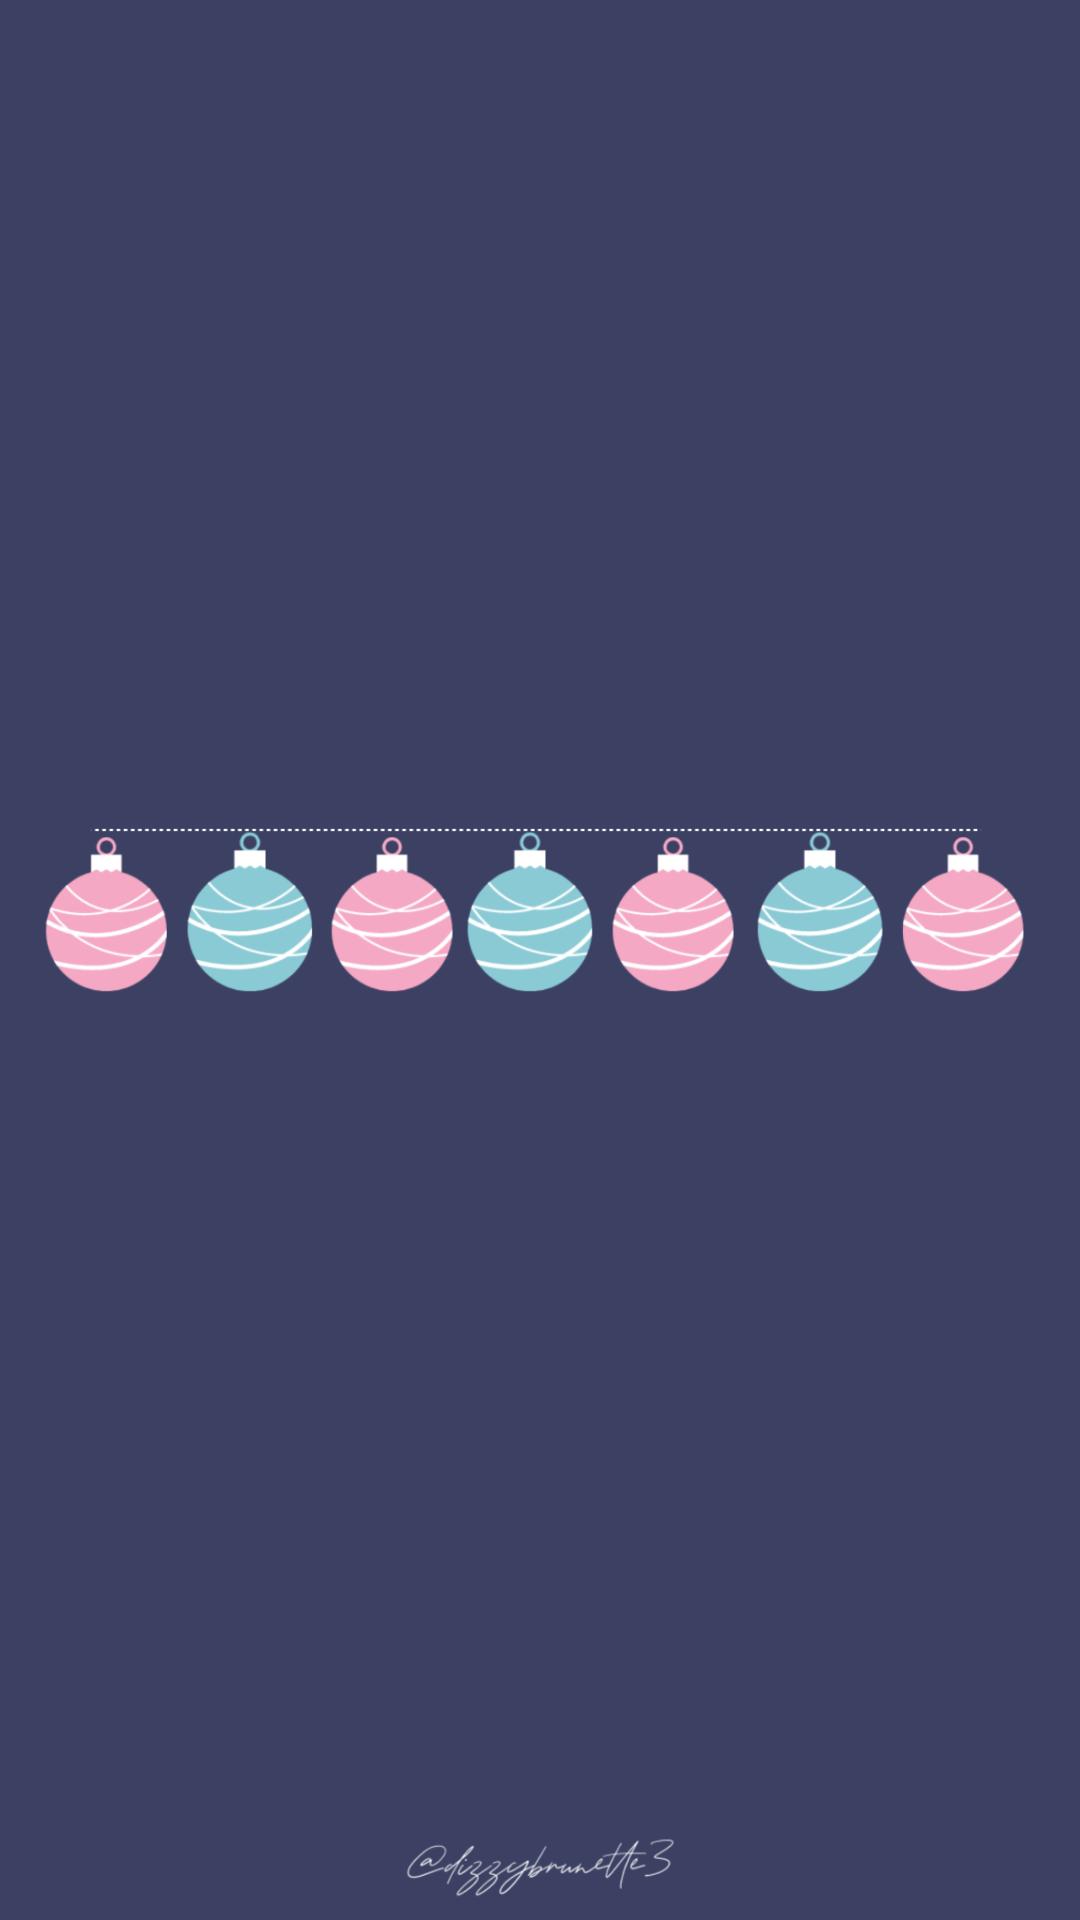 Christmas Phone Wallpaper Kecbio 1080x1920